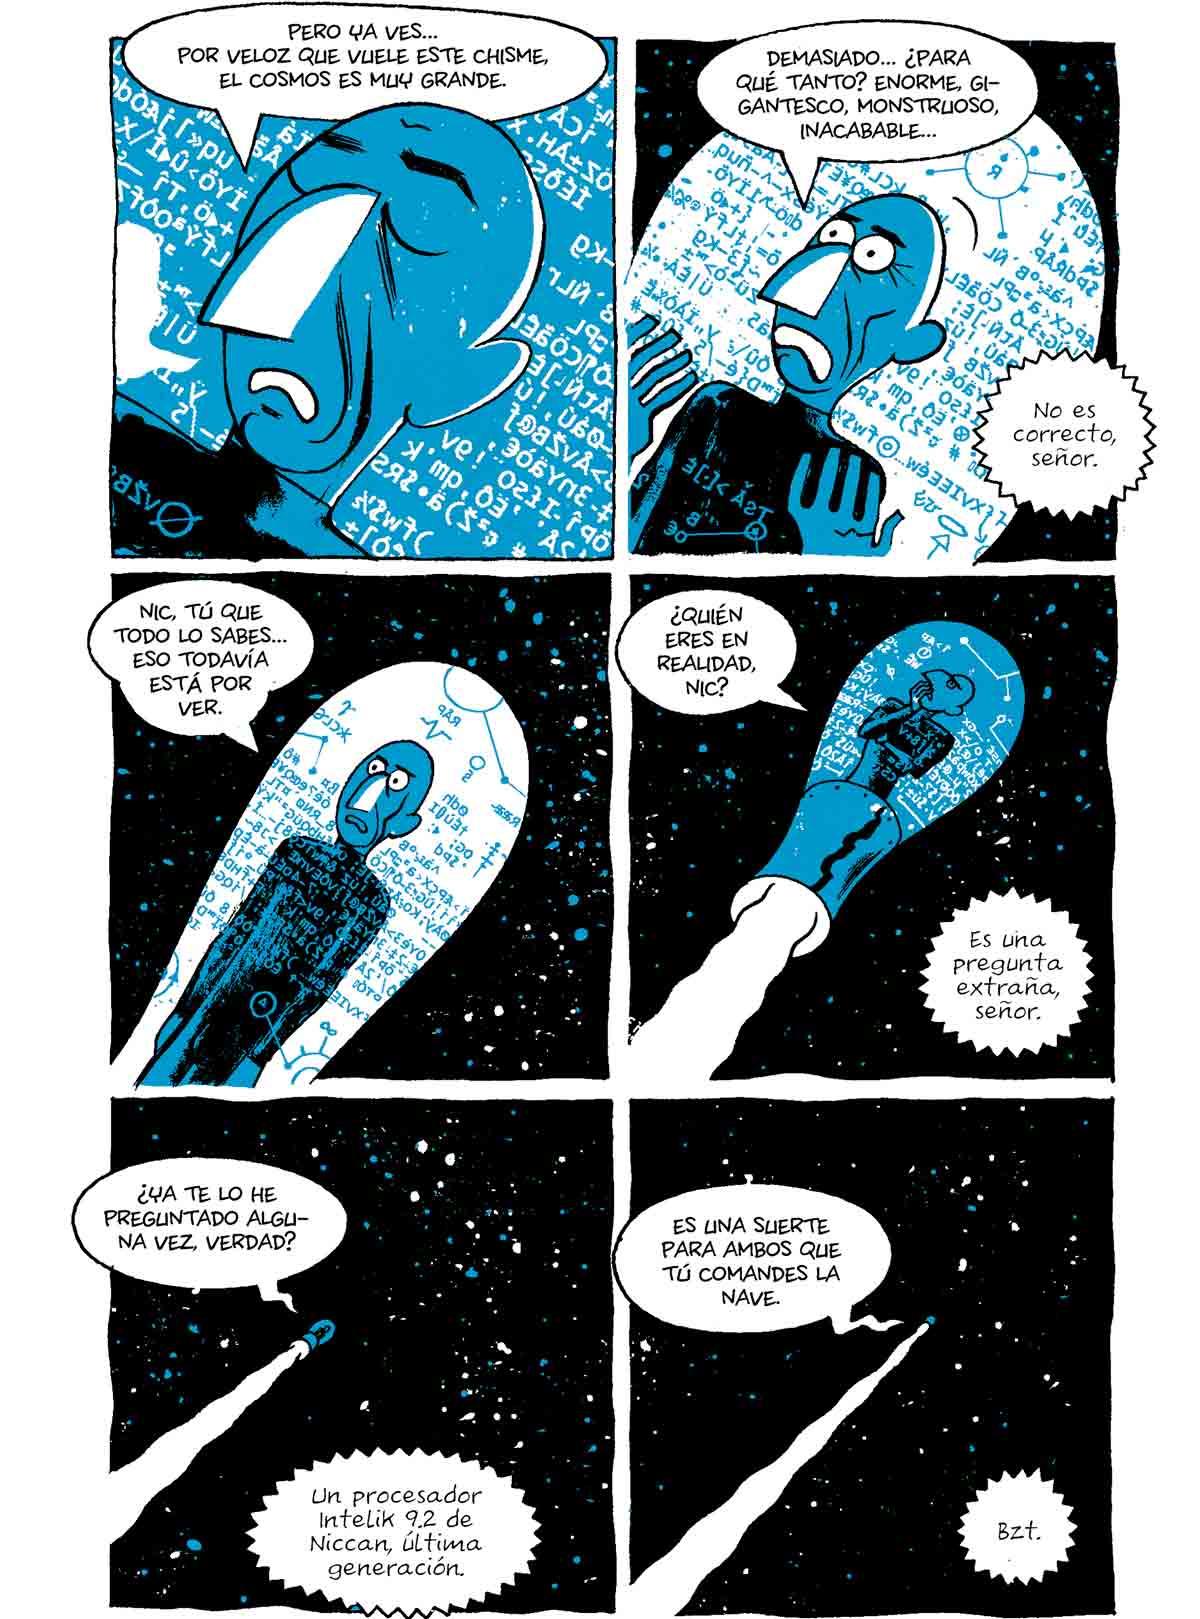 Novela-grafica-Golem-Comics-Cosmonauta-Pep-Brocal-Astiberri-04